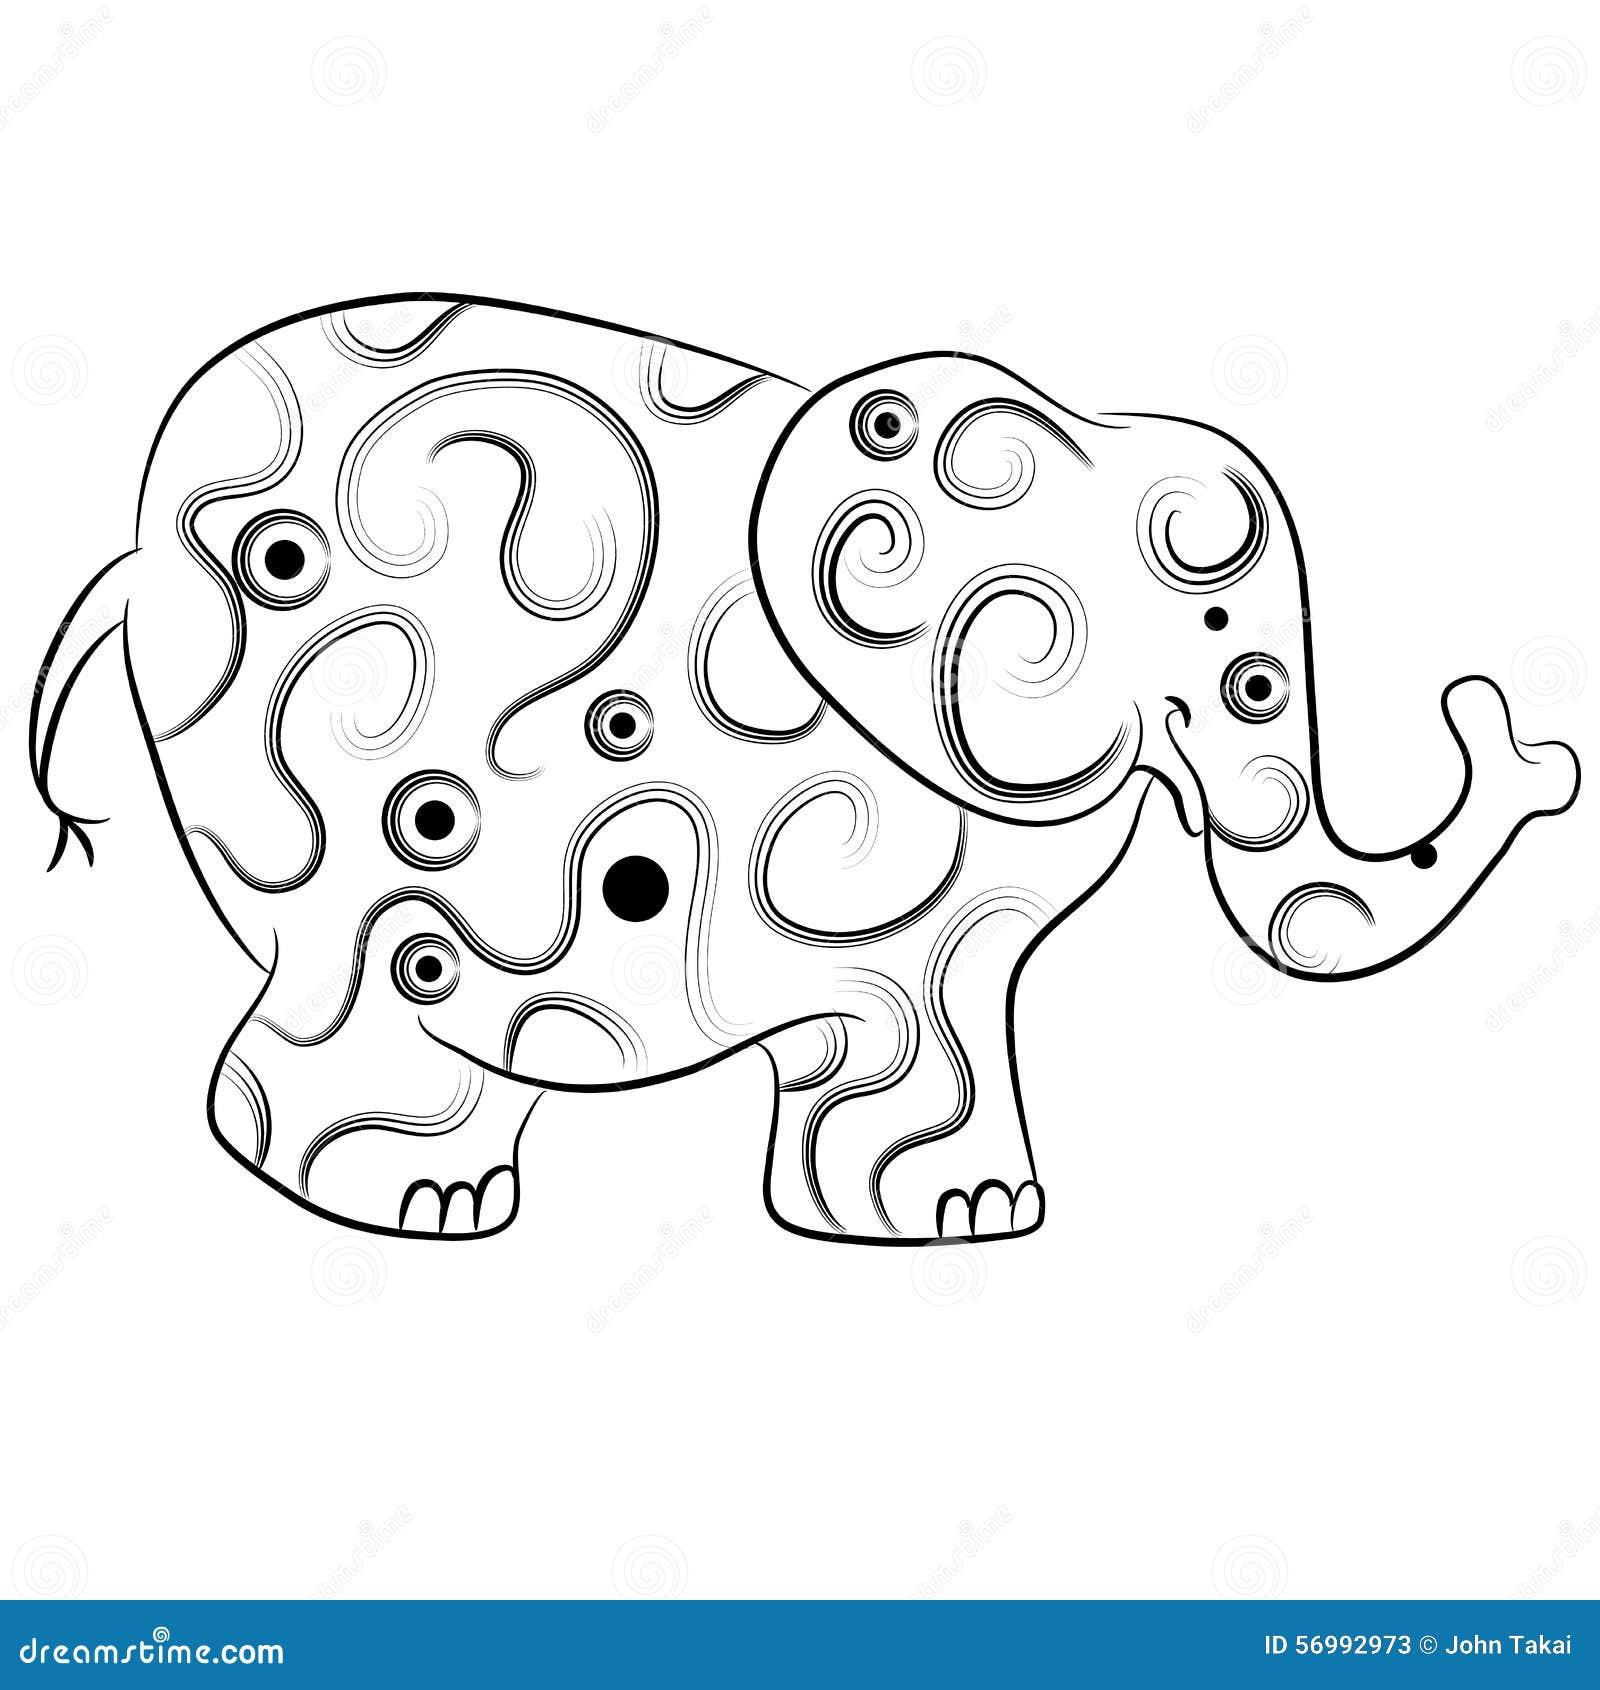 simple elephant outline zentangle style stock vector image 56992973